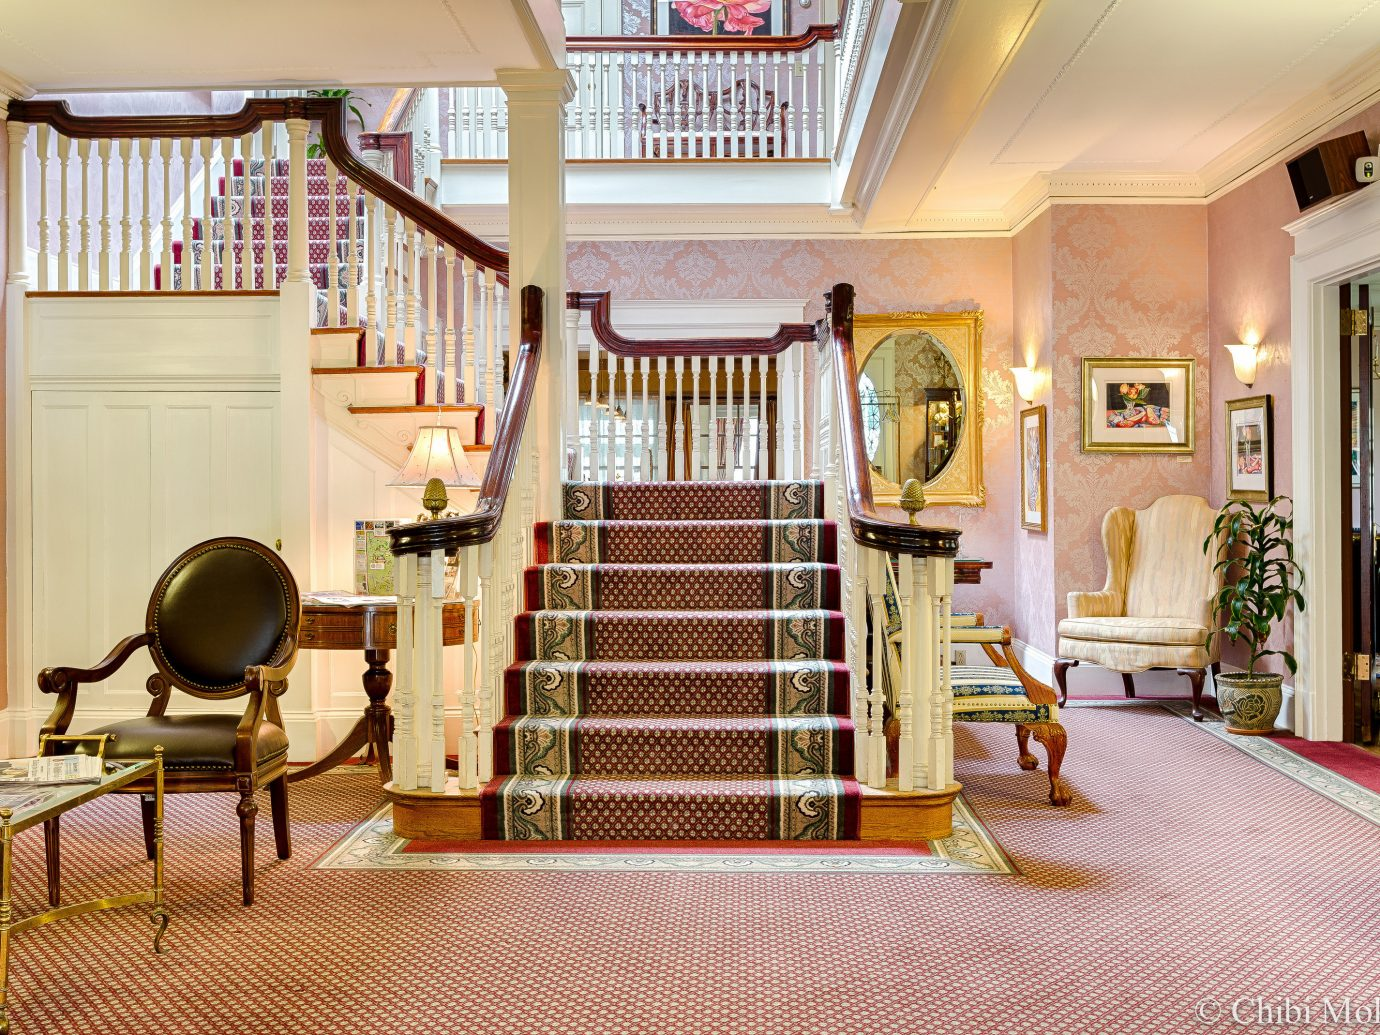 Romance Trip Ideas room interior design Lobby home furniture flooring stairs real estate floor estate hall house